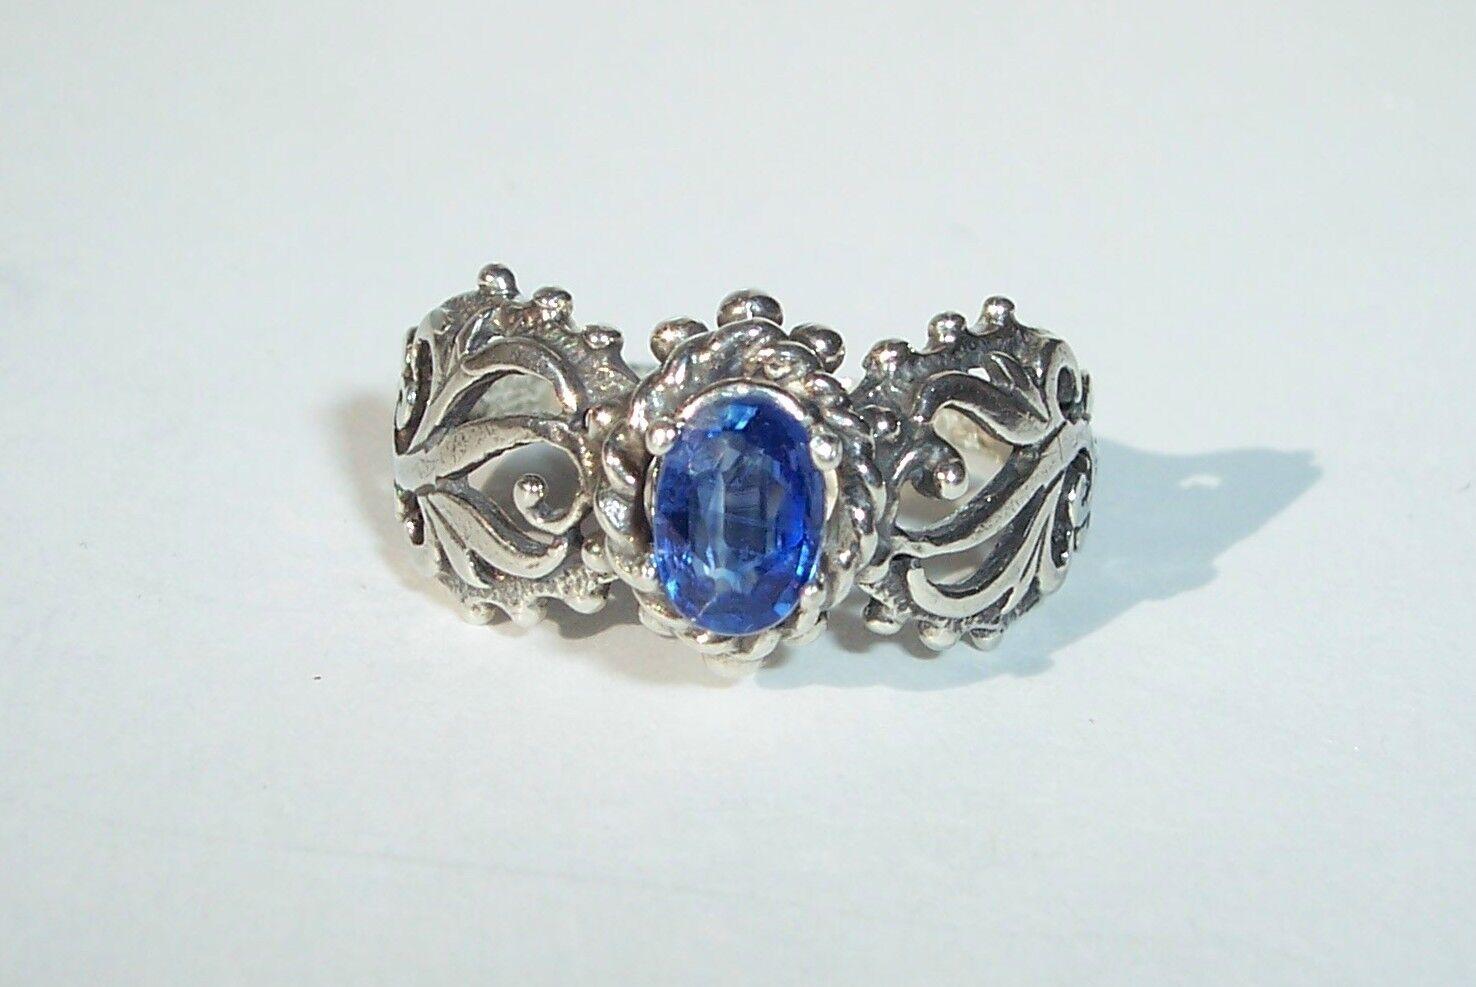 Beautiful Royal bluee Kyanite small 6x4mm oval USA Made Sterling Filigree sz 8